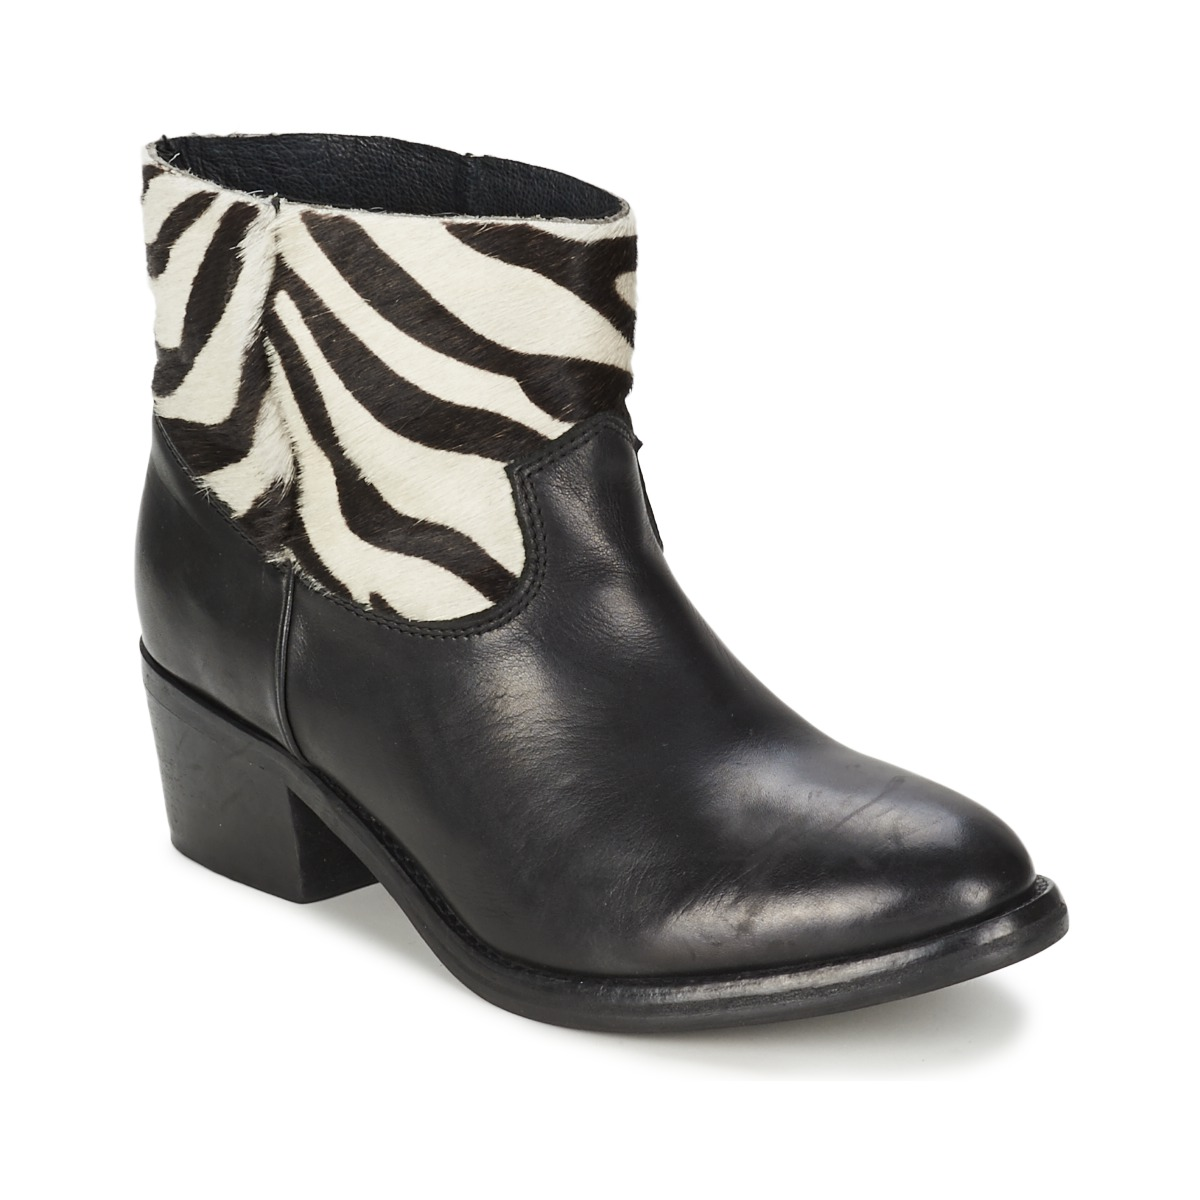 80fceeaff629fe Koah ELEANOR Schwarz - Kostenloser Versand bei Spartoode ! - Schuhe Boots  Damen 94